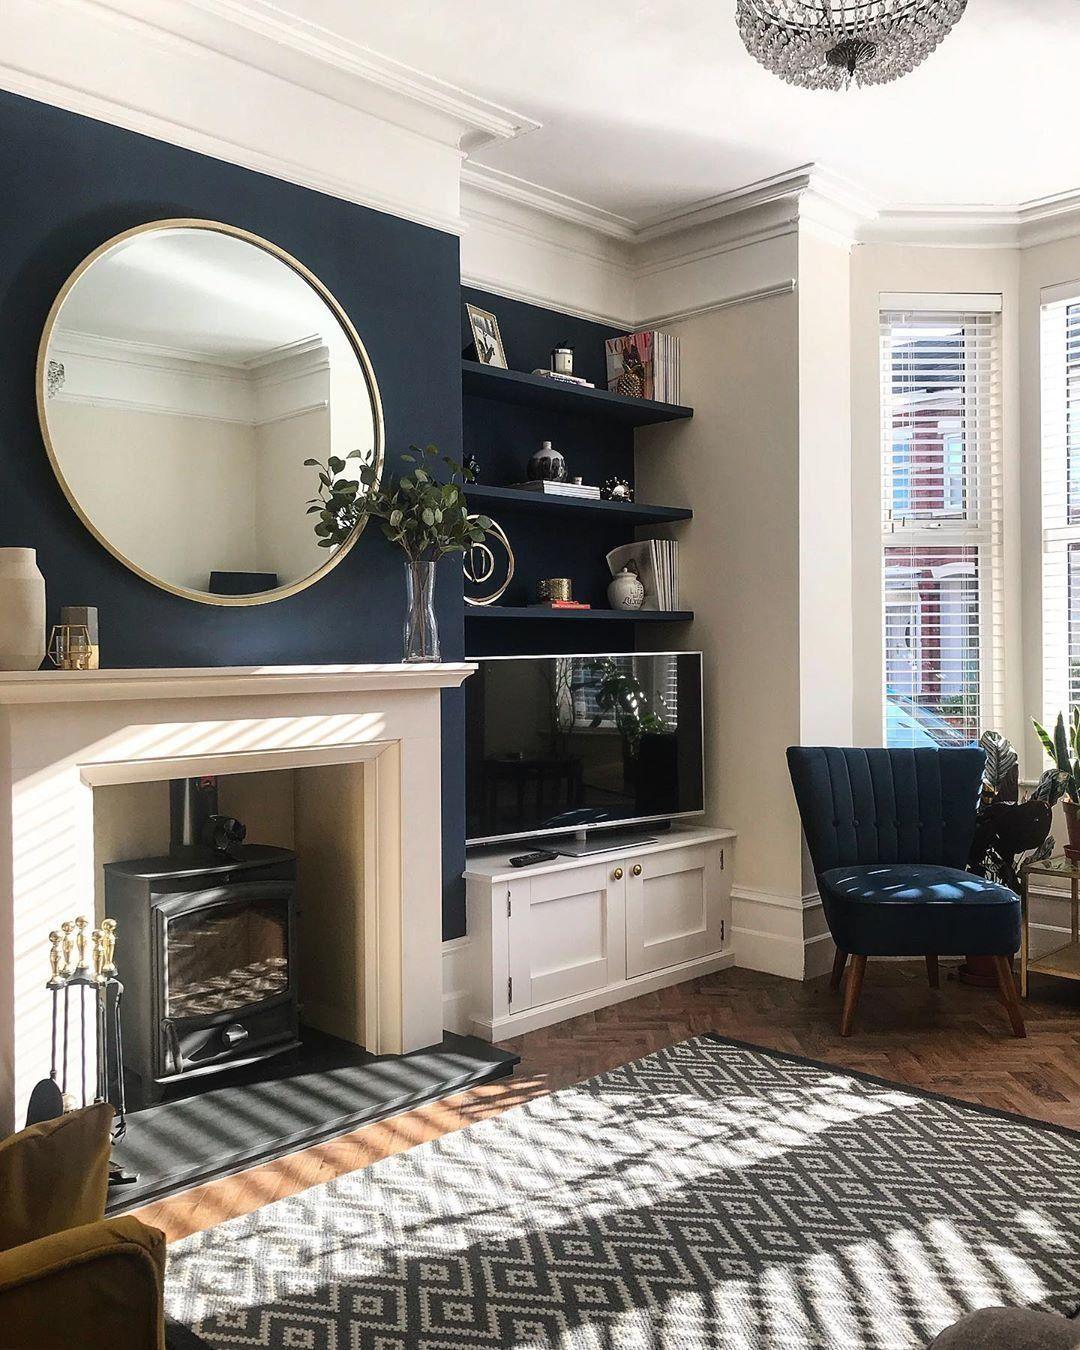 Semicircular Ktv Room Interior Design: Pin On Small Greenhouse Ideas